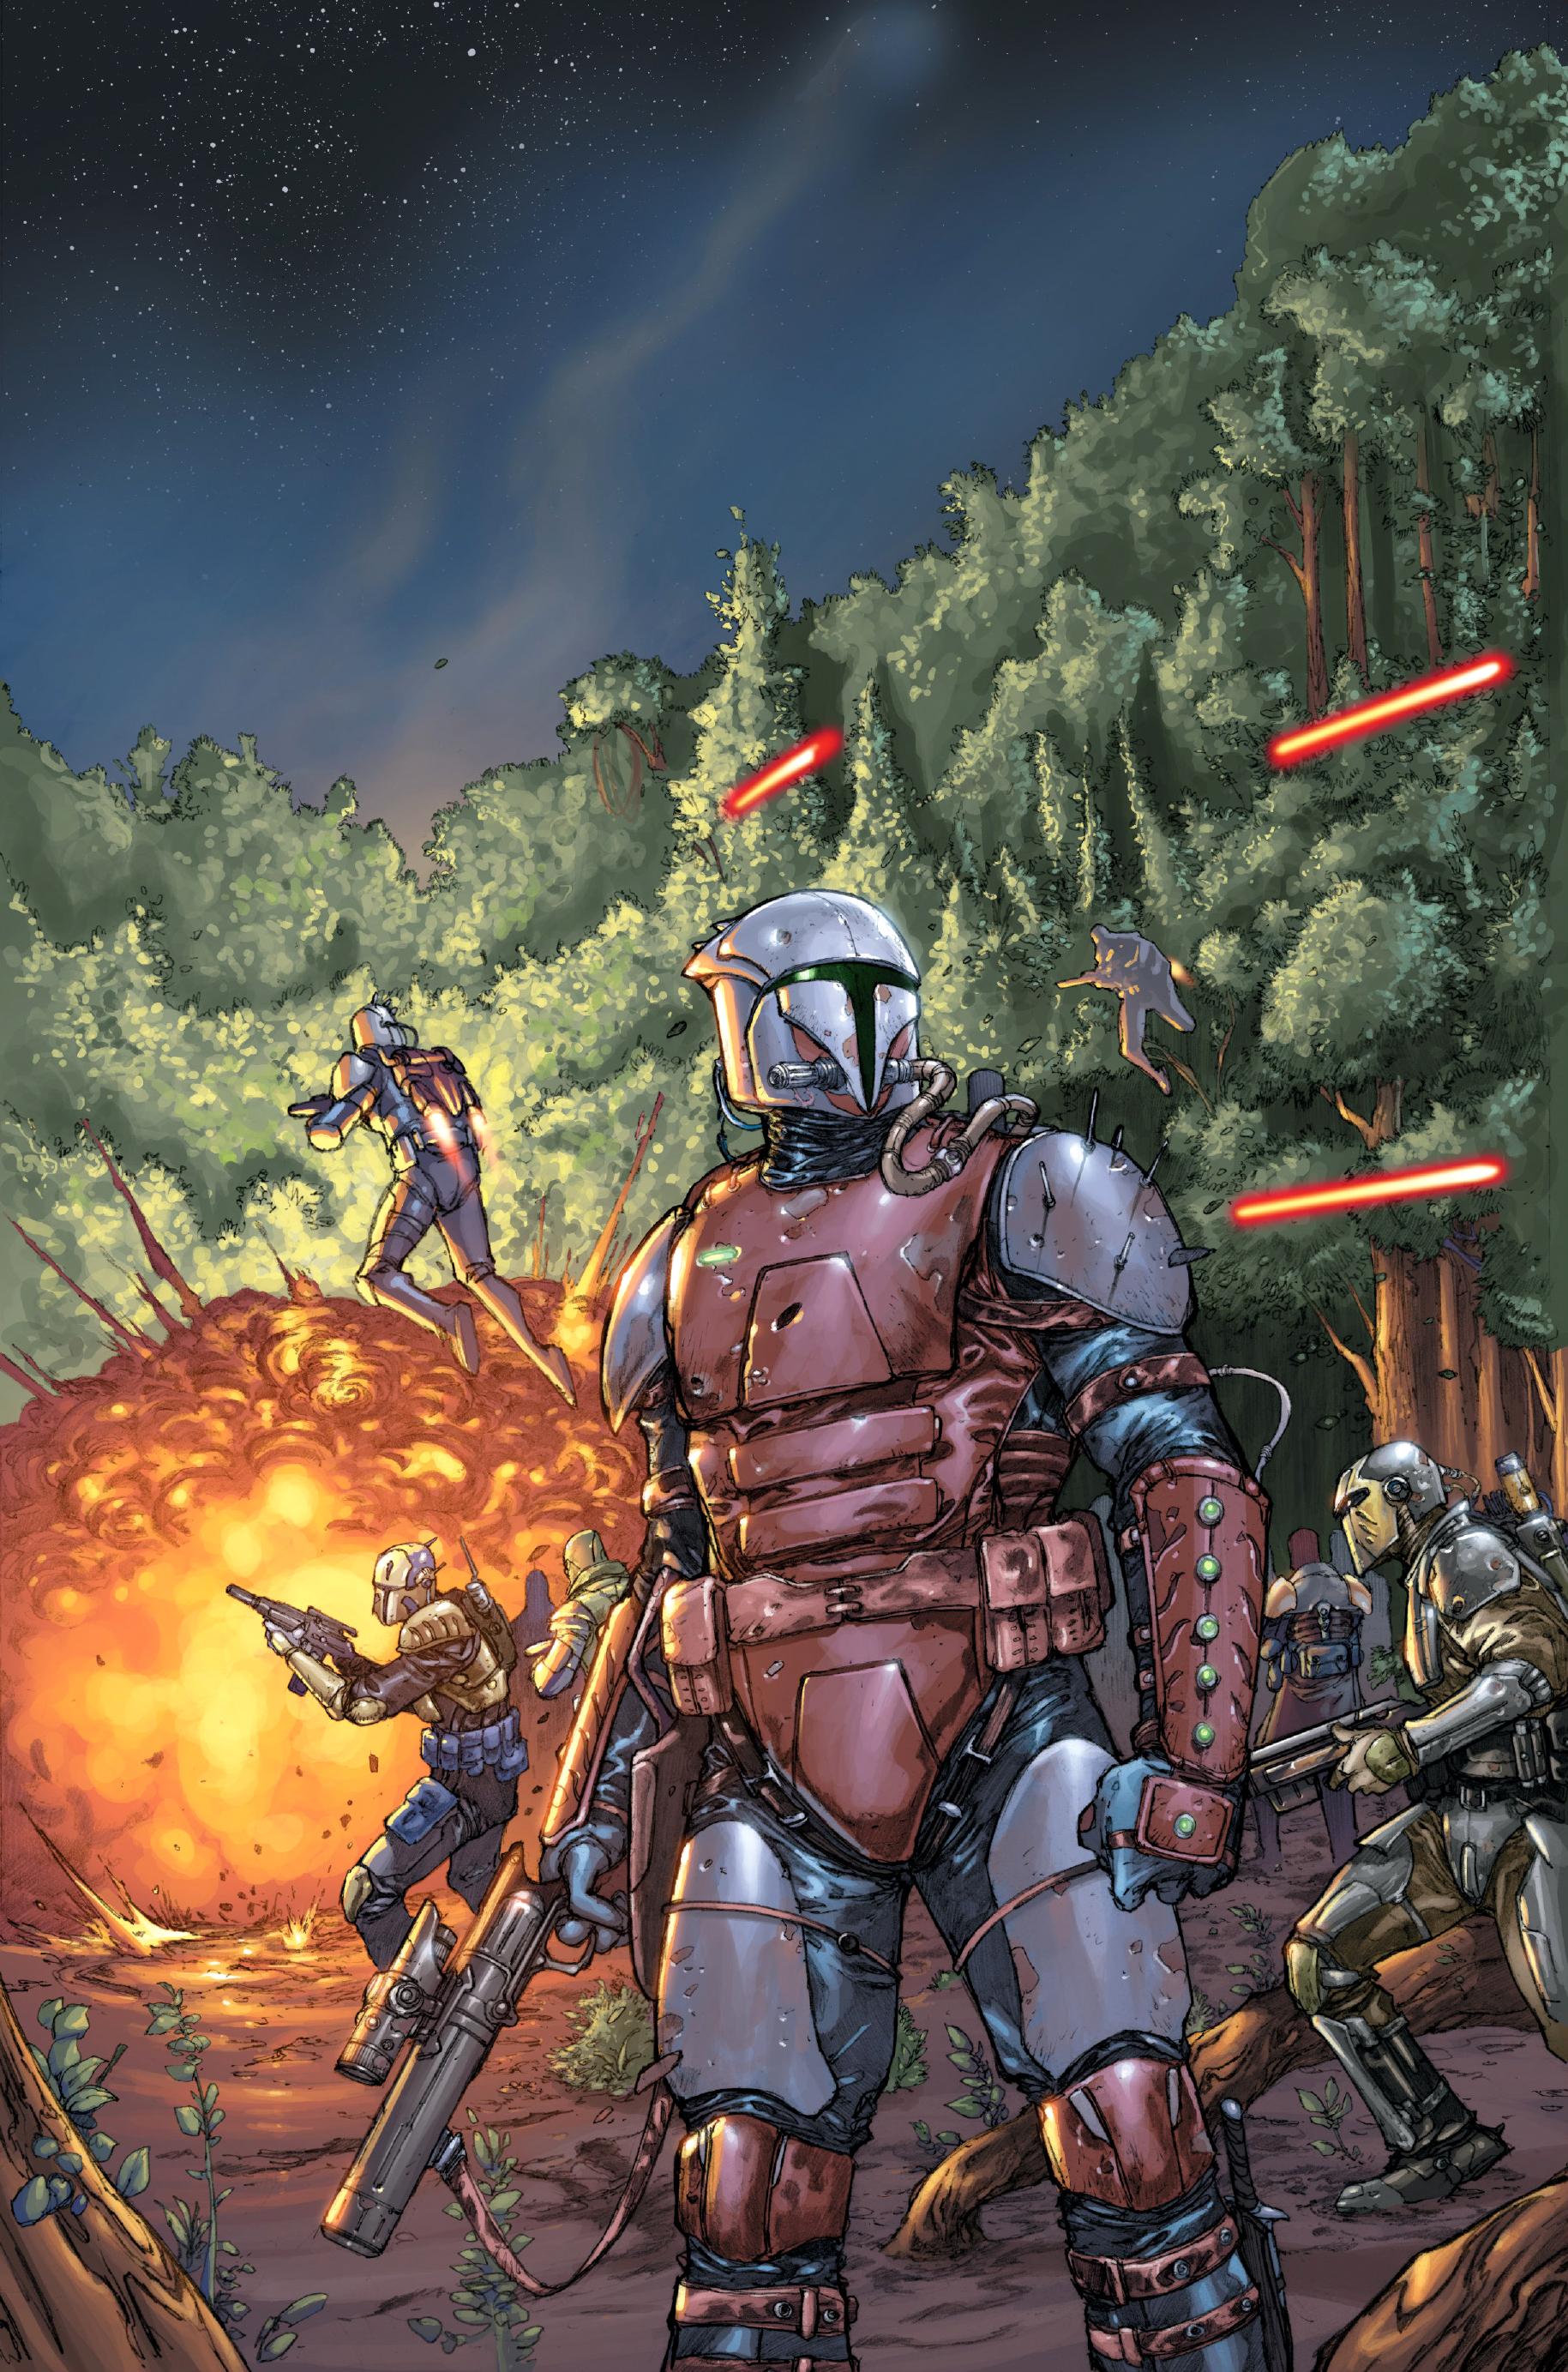 Lego Star Wars Mandalorian base on Geonosis | Hi, guys ... |Star Wars Mandalorian Base